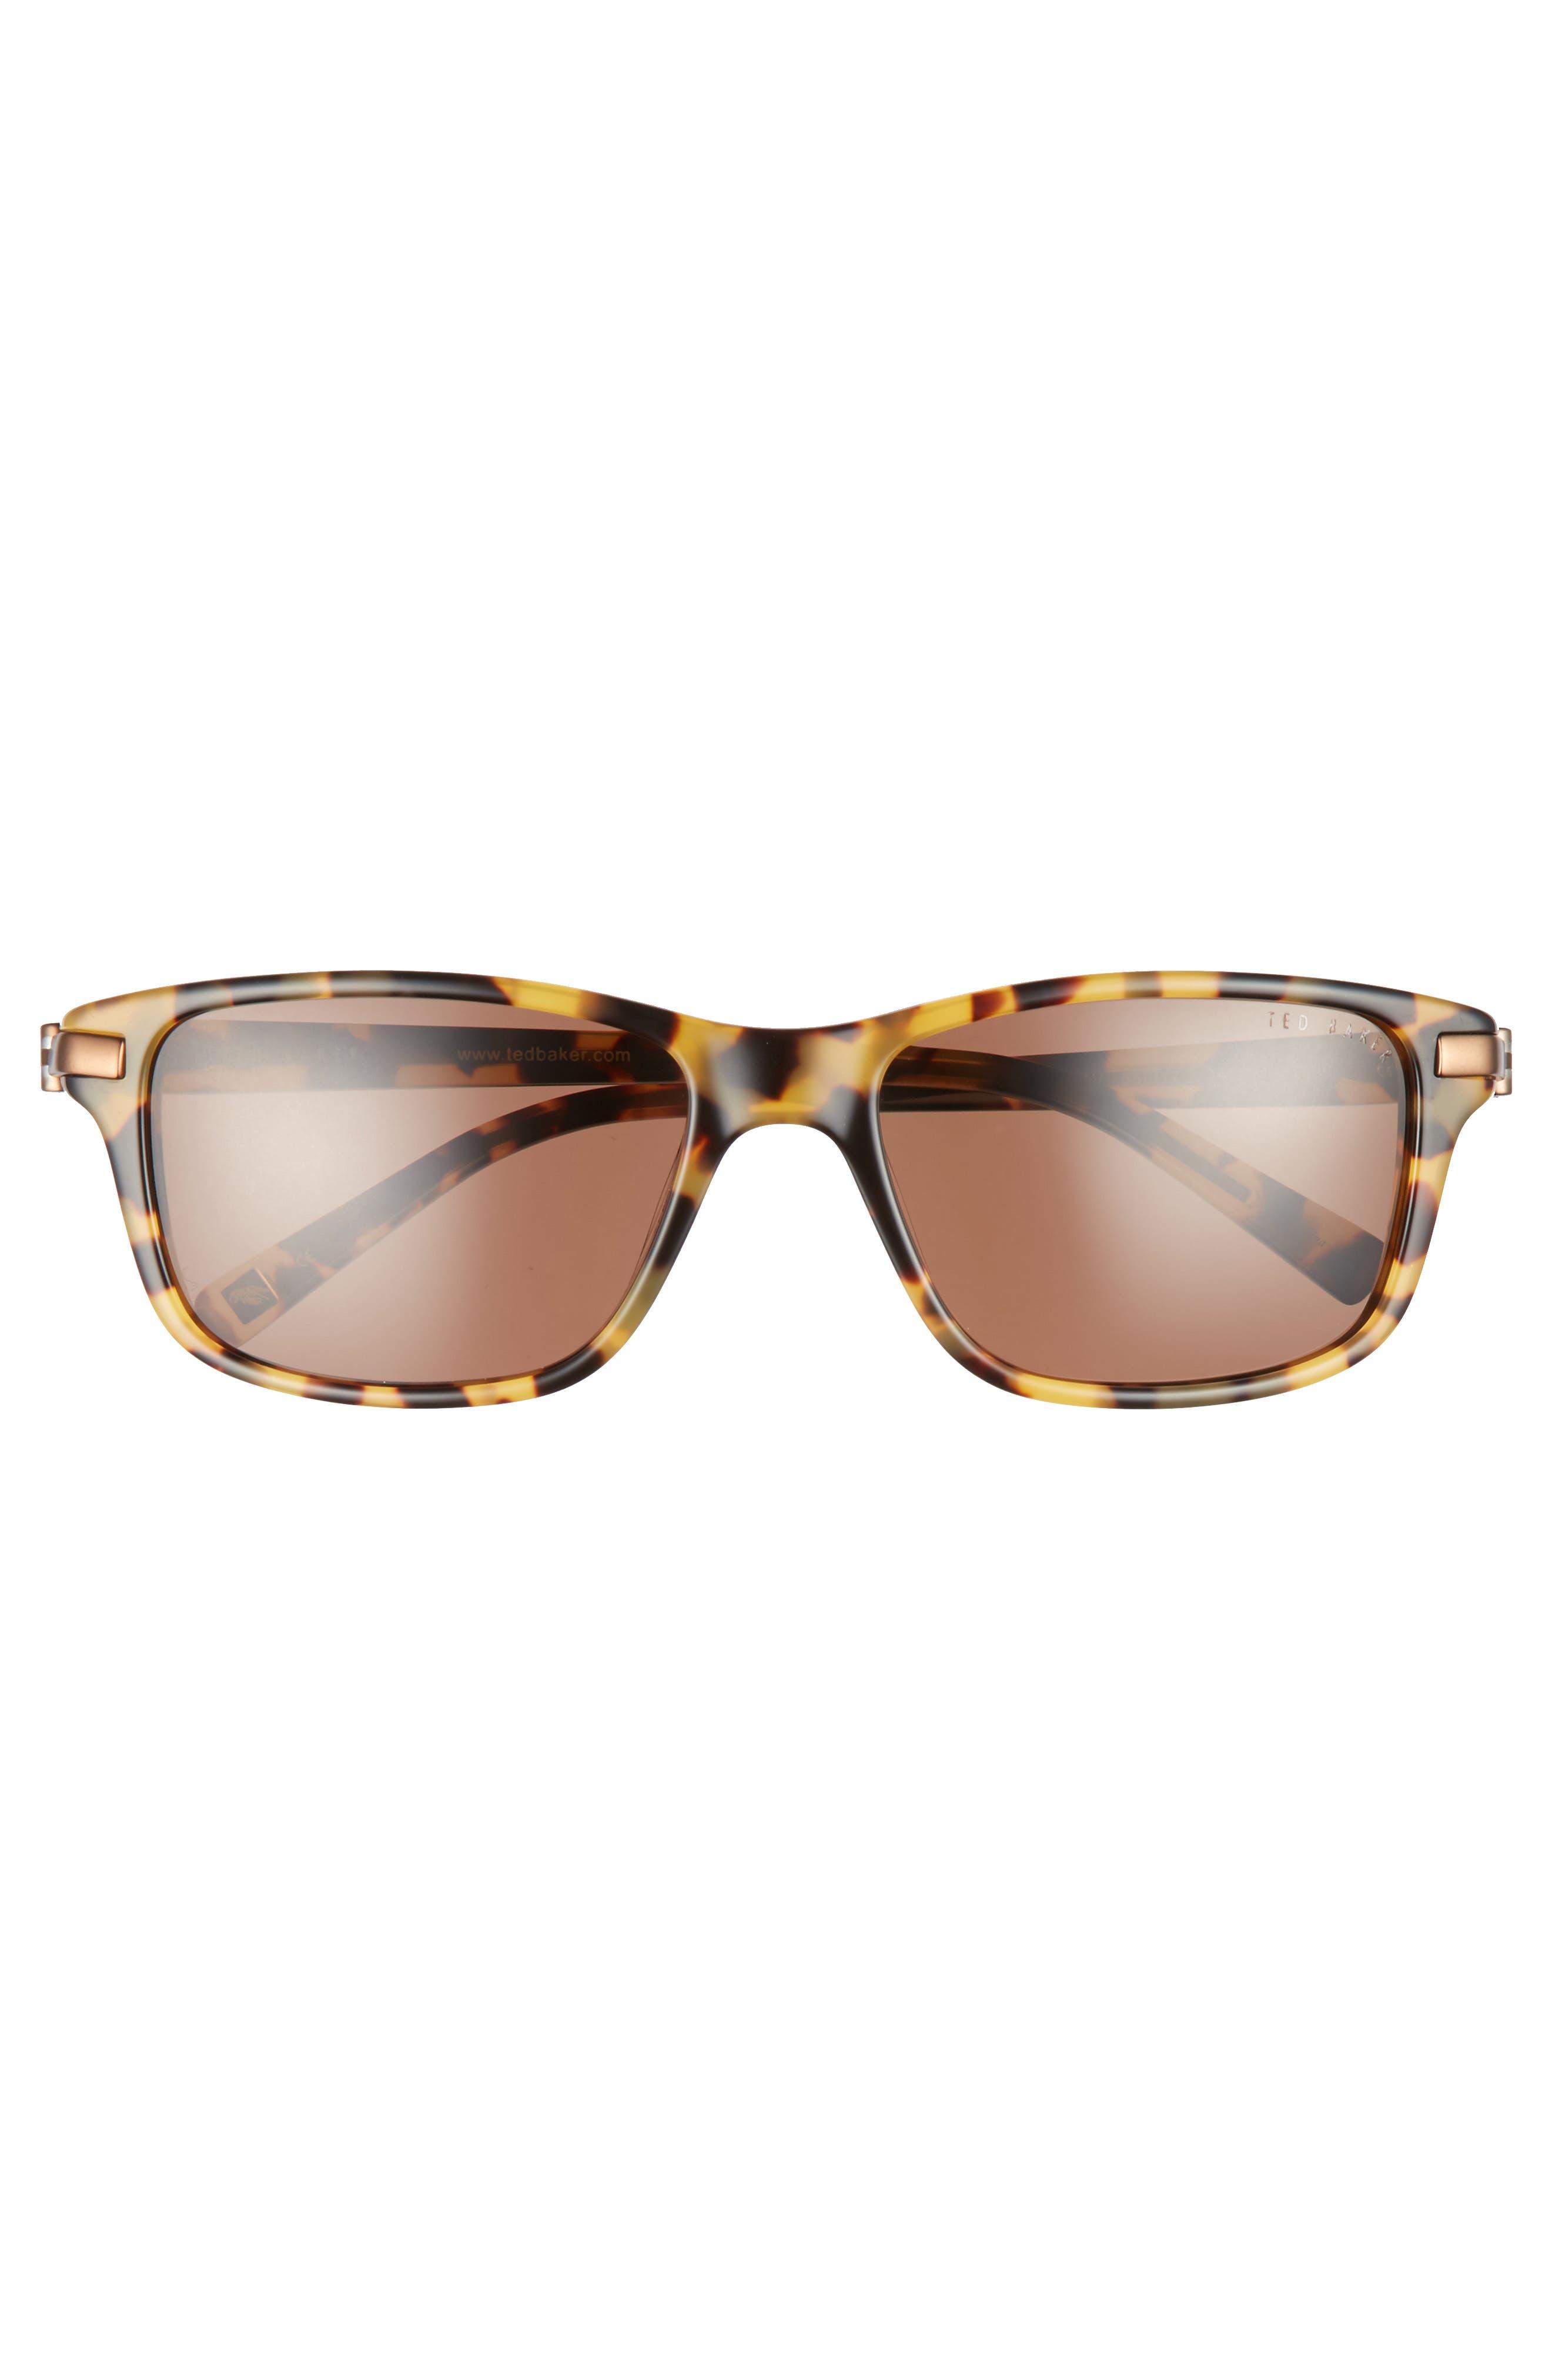 55mm Polarized Sunglasses,                             Alternate thumbnail 2, color,                             Havana